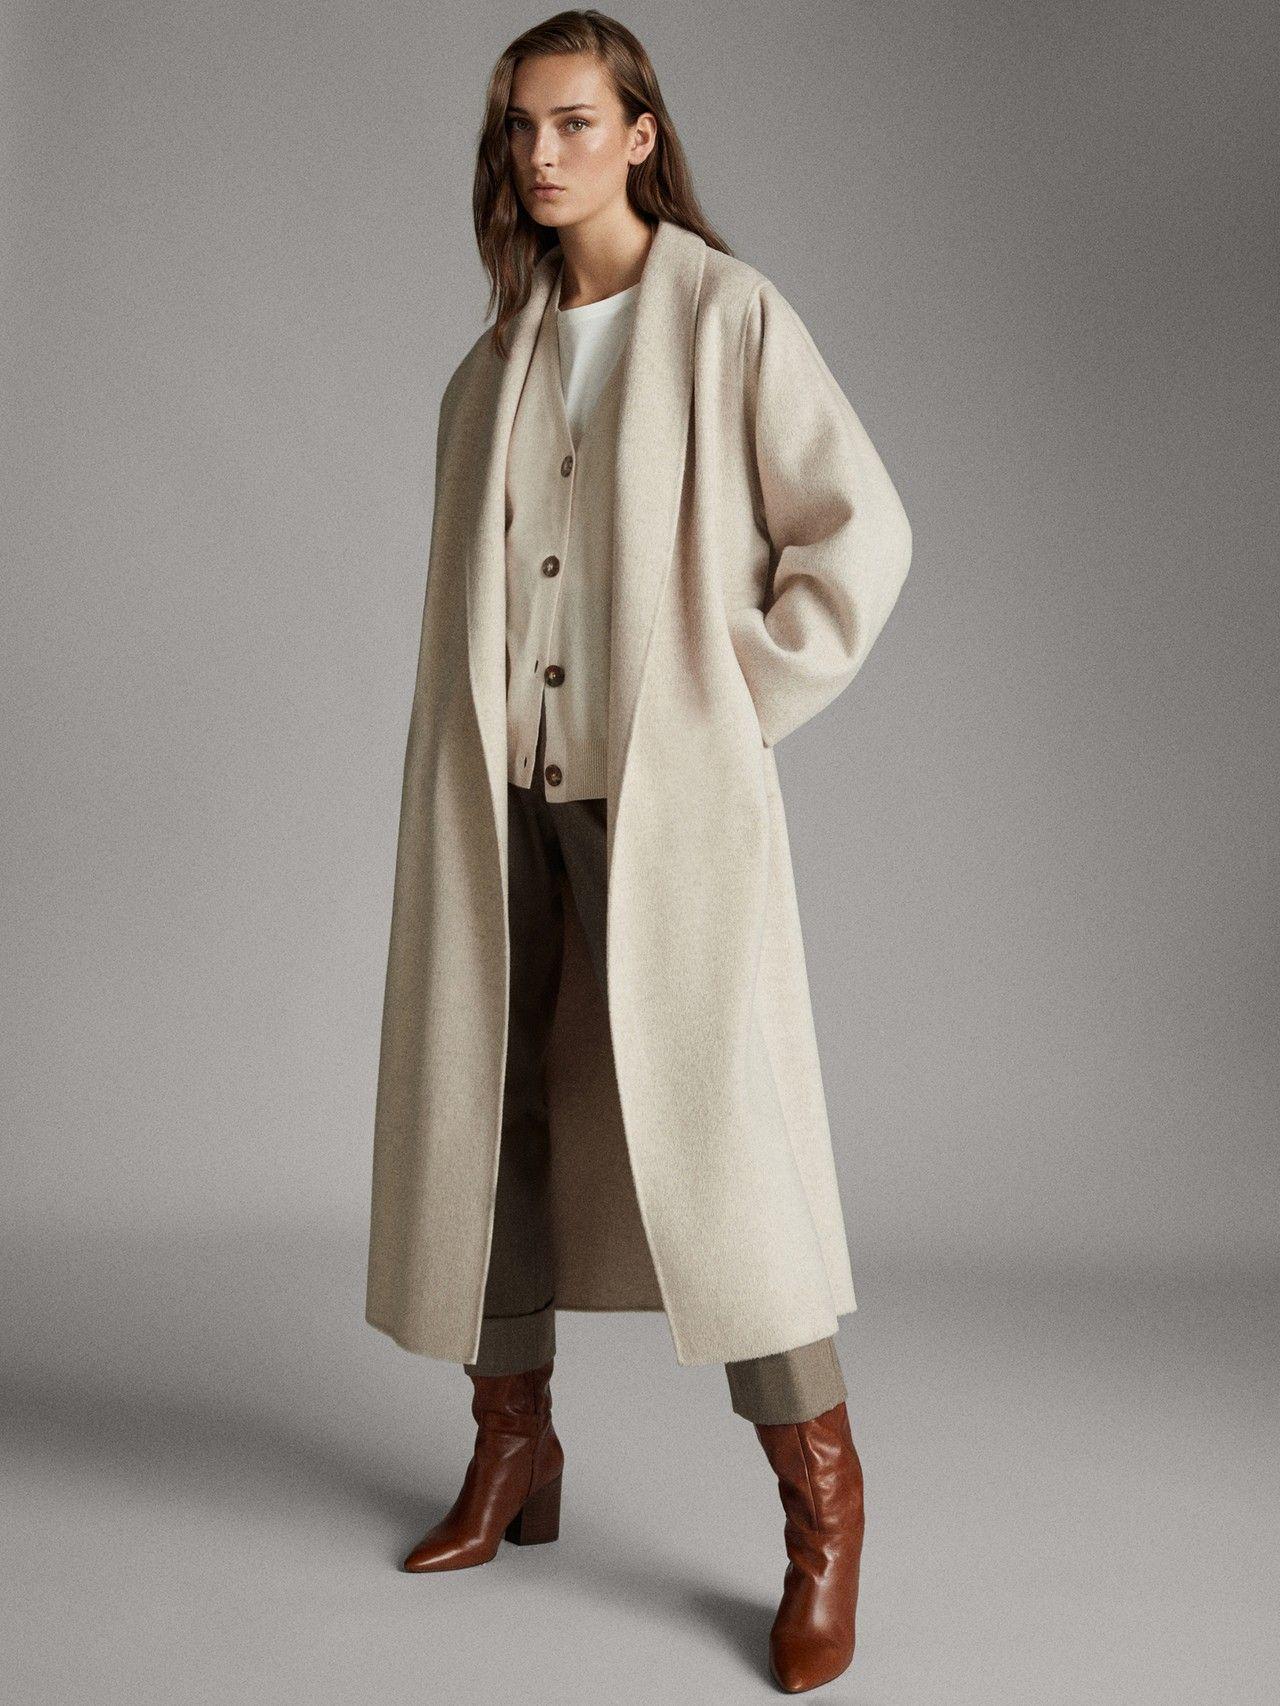 Massimo Dutti Mujer Cardigan Cuello Pico Botones Lana Beige M Cardigan Coat Coat Outfits